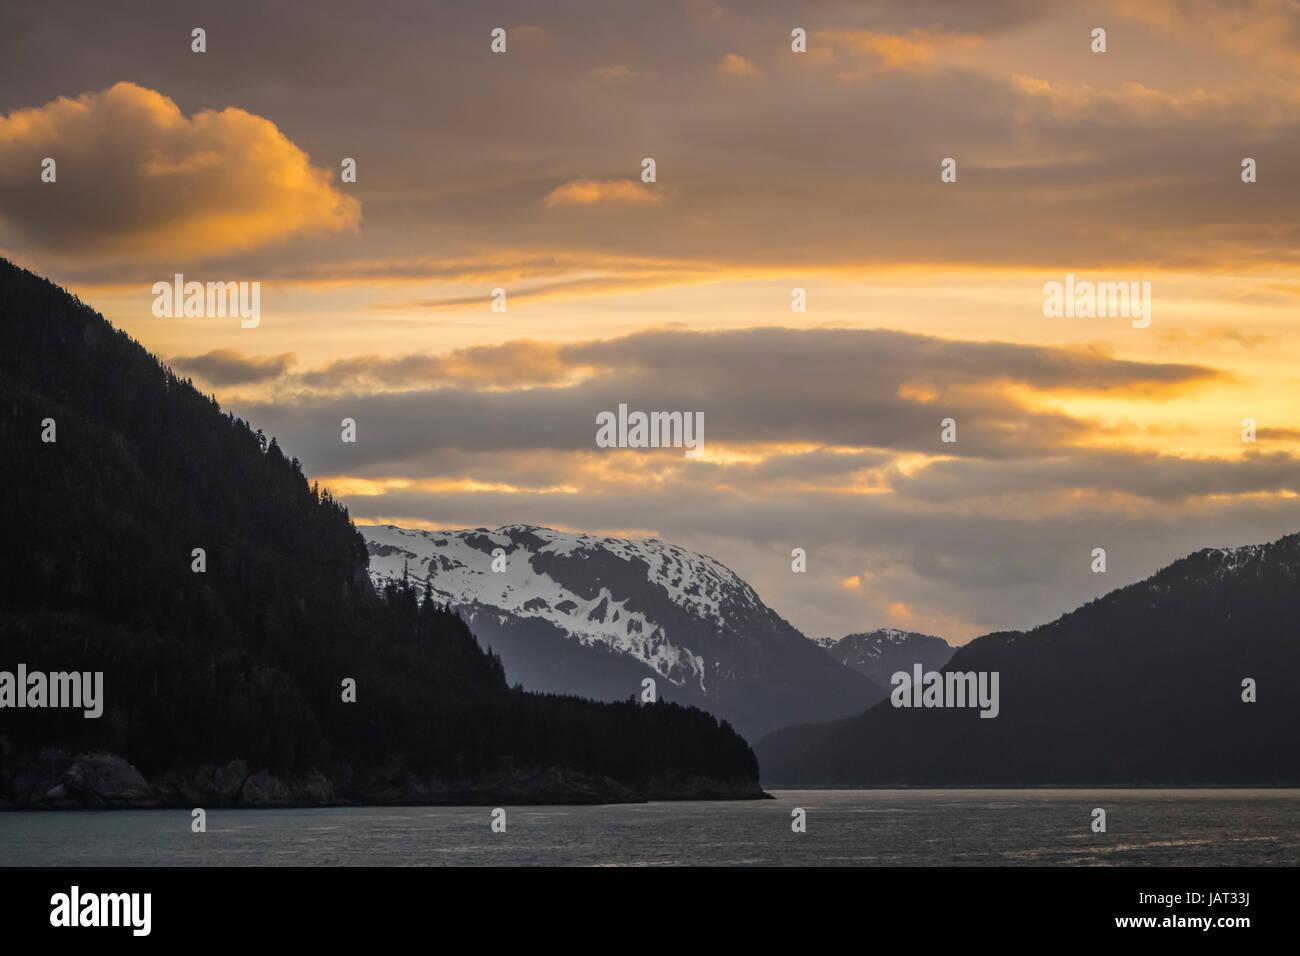 Sunrise over the mountains near Glacier Bay, Alaska, USA. - Stock Image